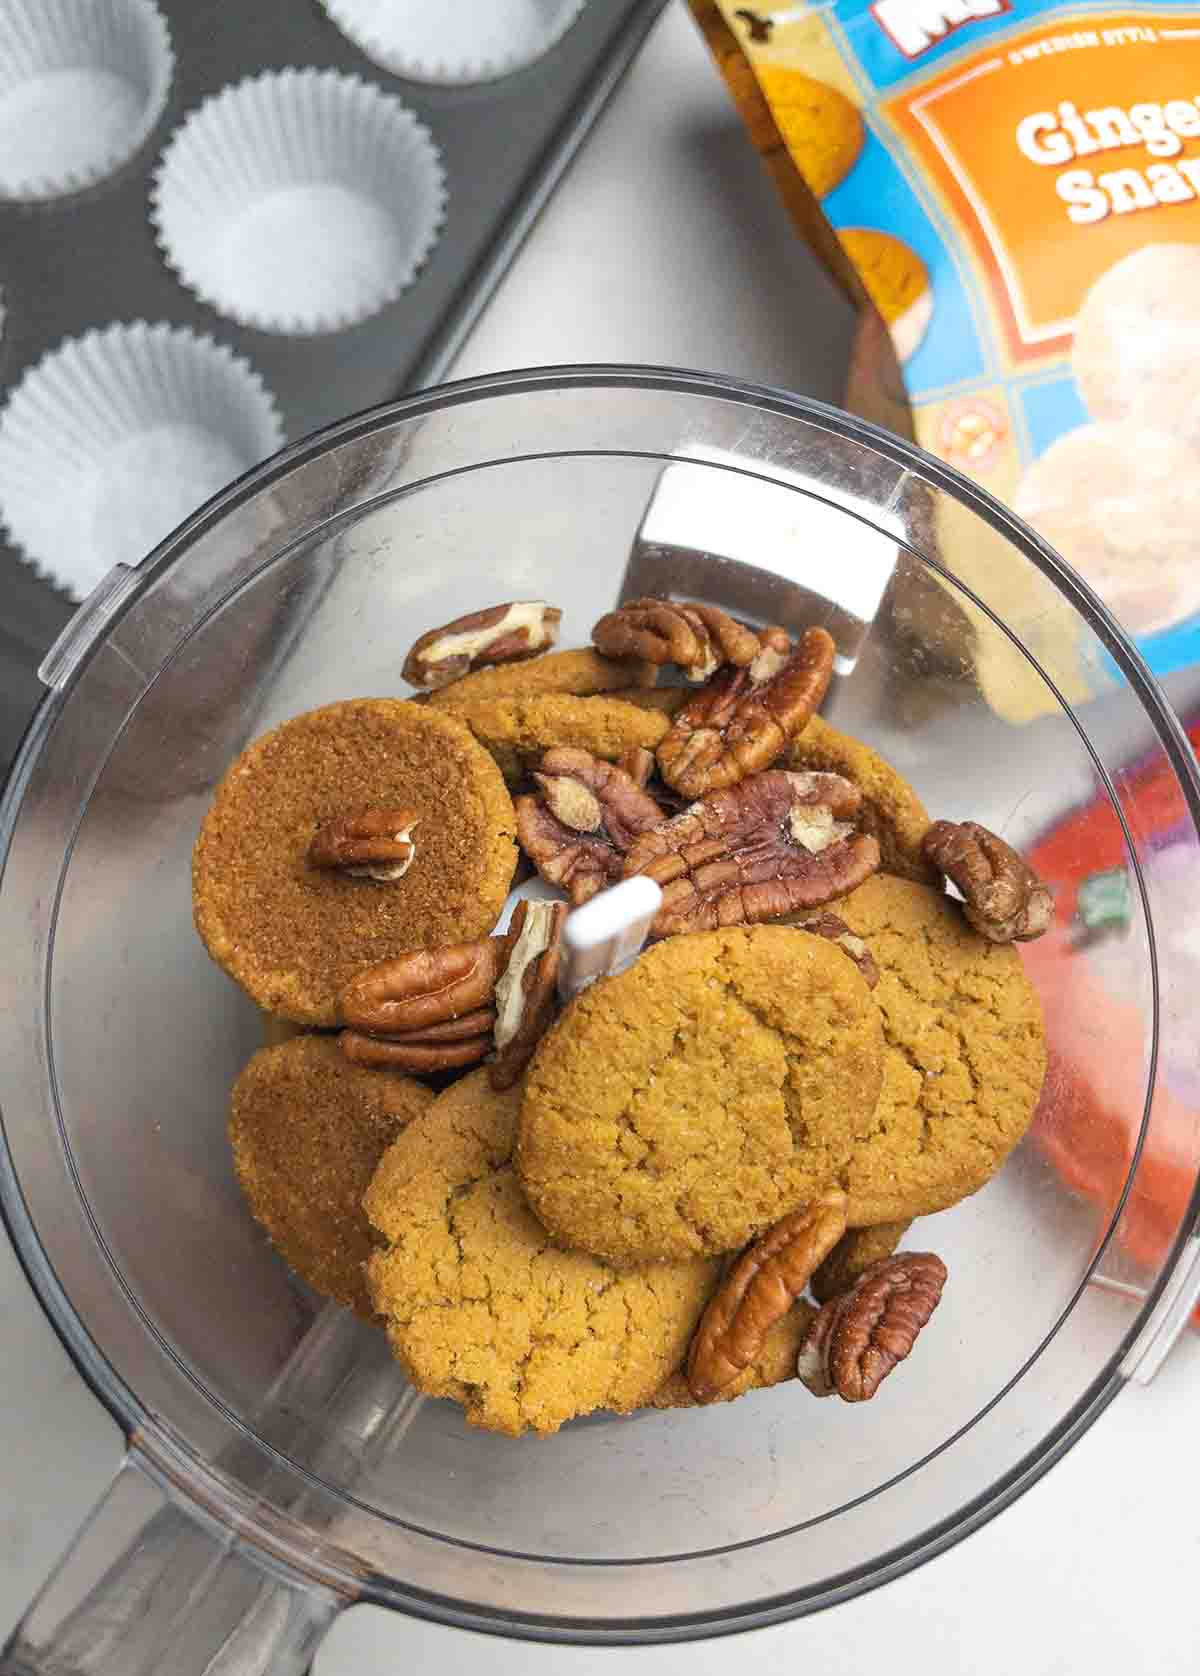 Mini Pumpkin Pies with Gingersnap Crust (Gluten Free Dairy Free)